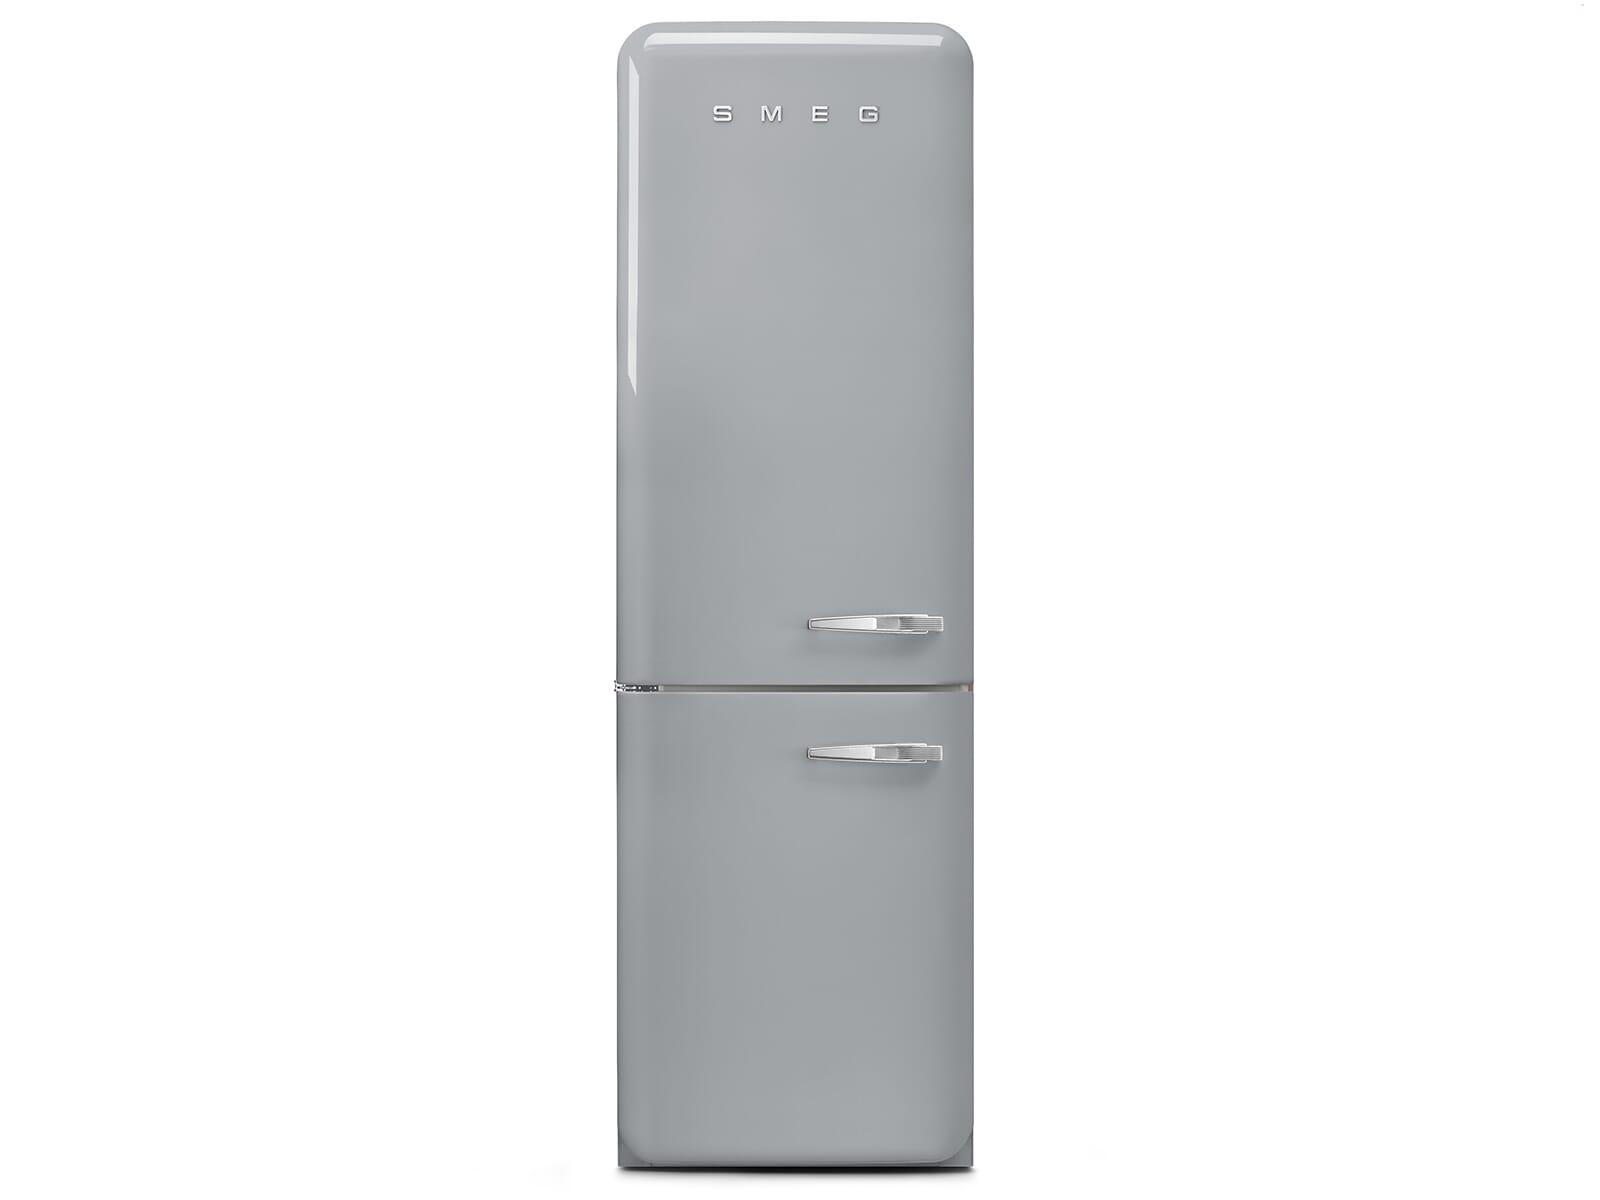 Smeg Kühlschrank Groß : Smeg kühlschrank fab rdbb möbel haas gmbh einr der nordeifel